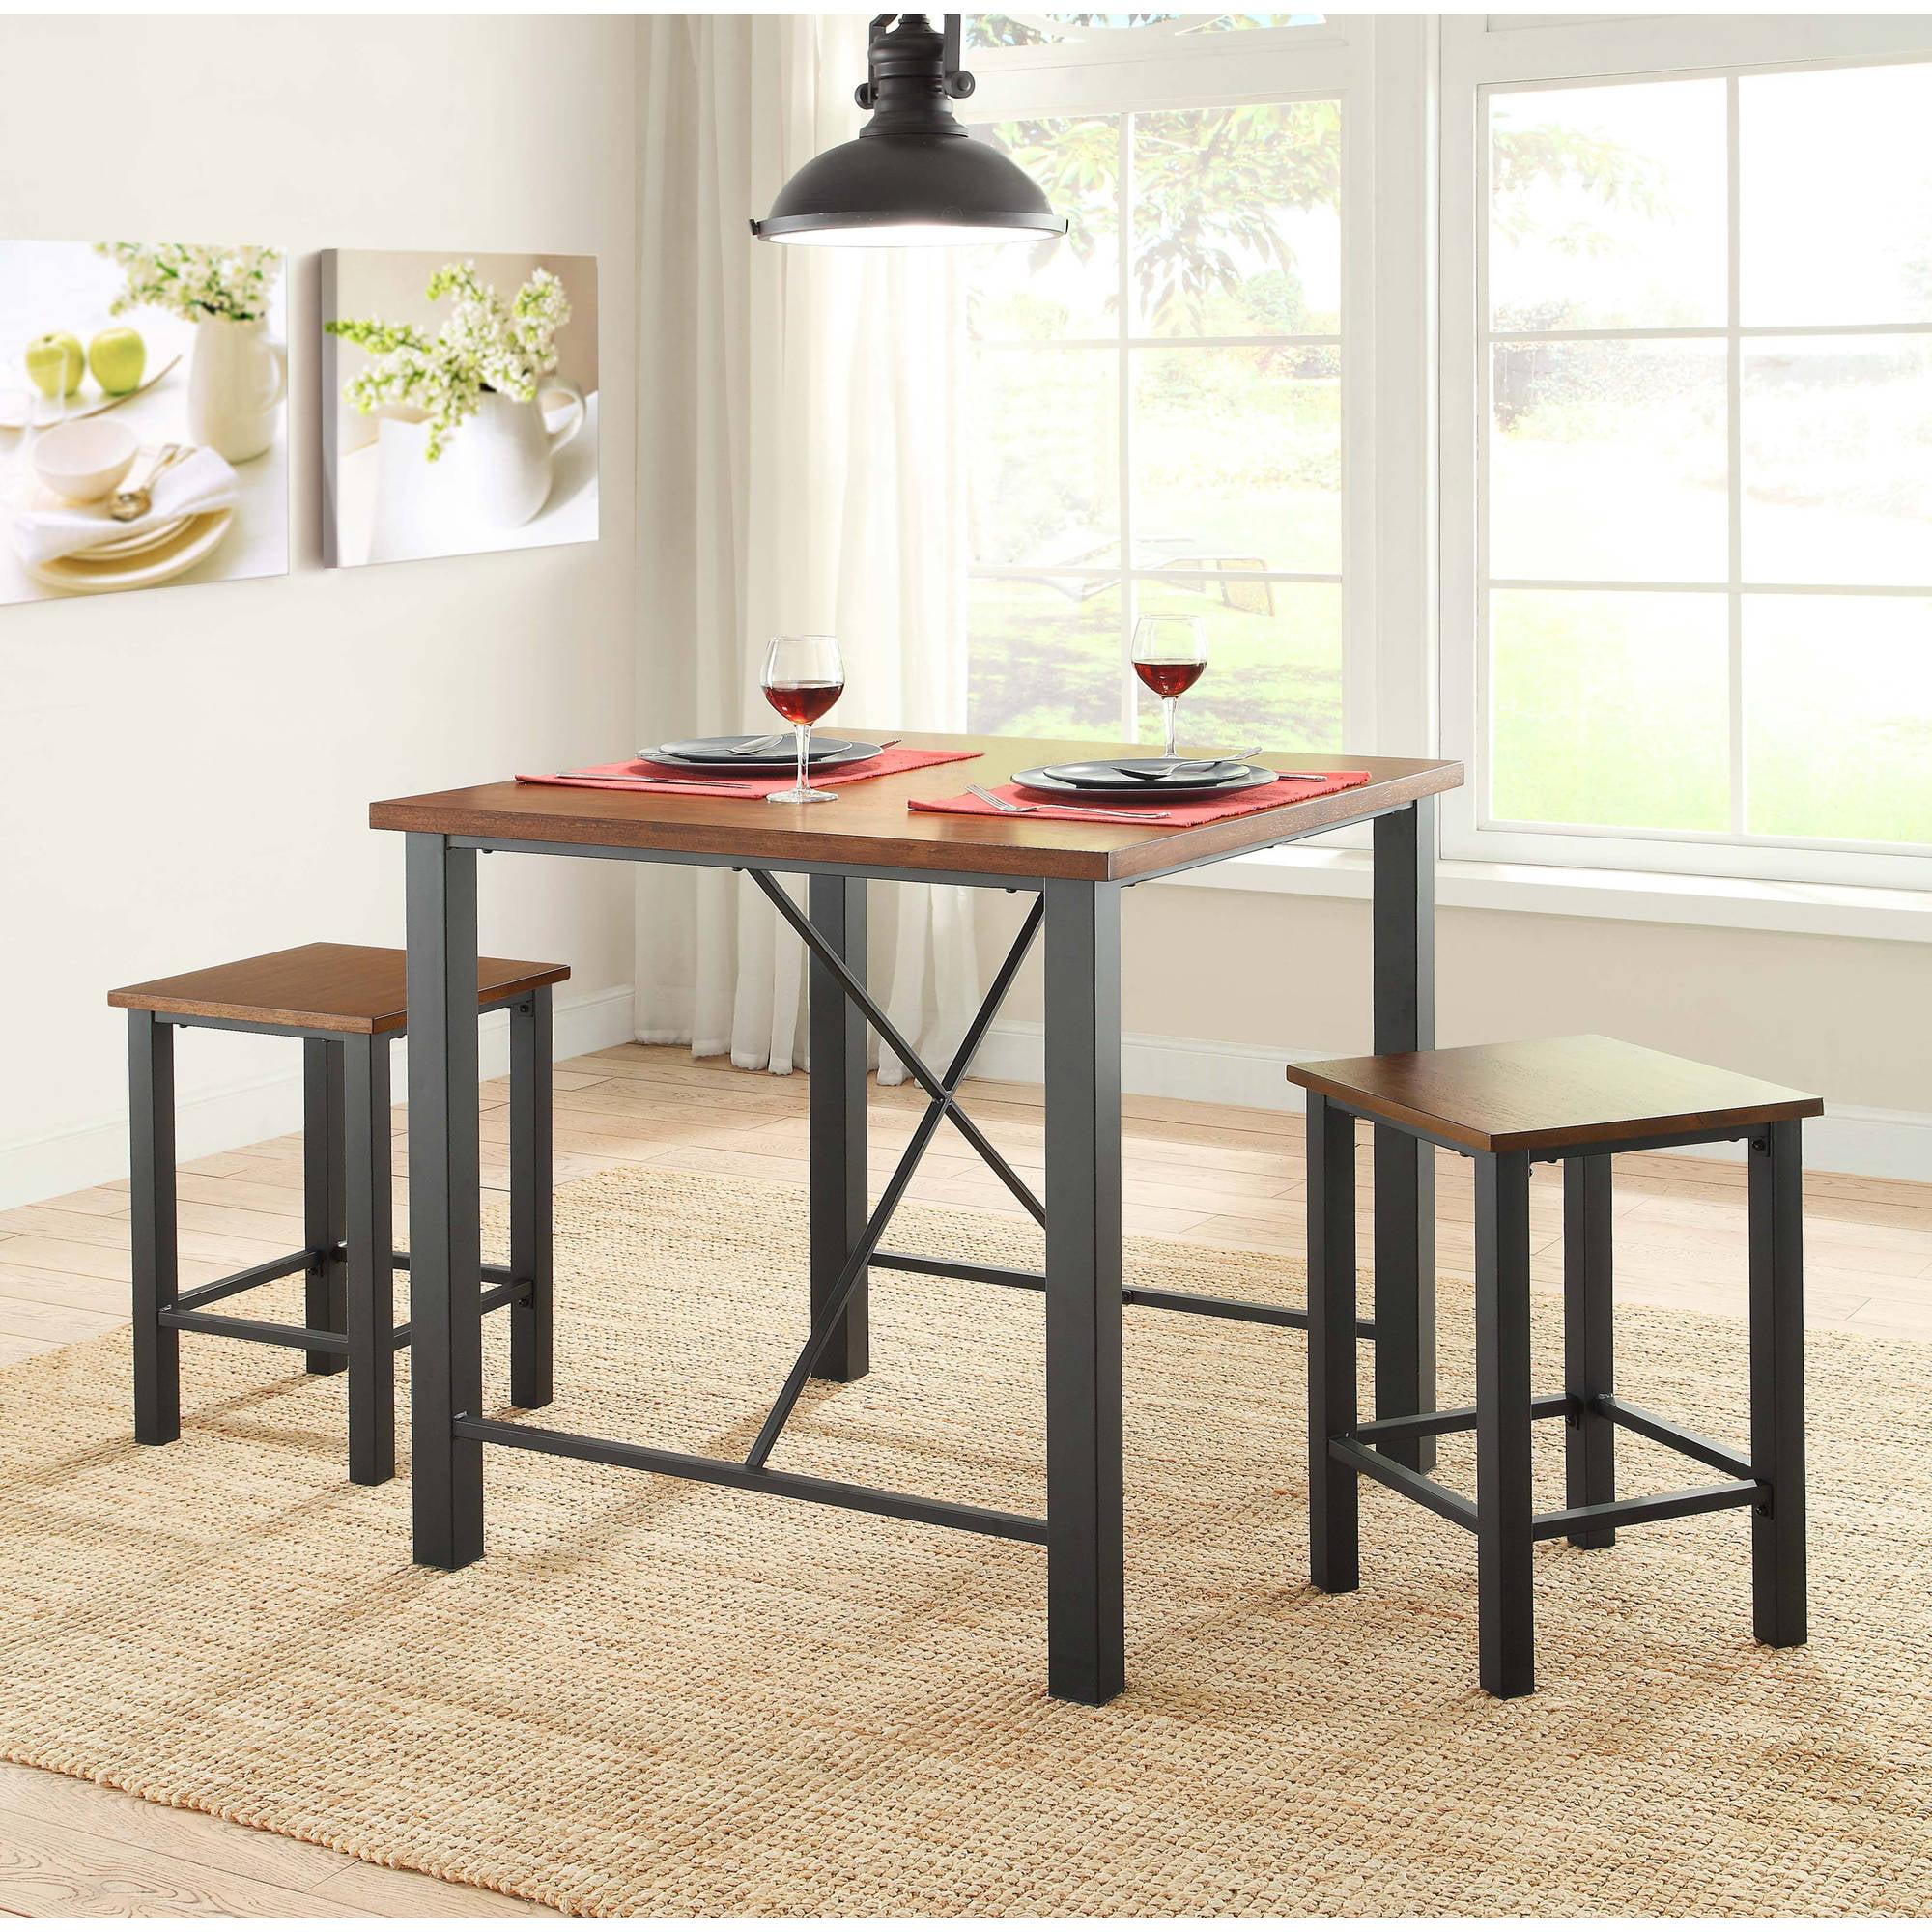 KitchenDining FurnitureWalmartcom